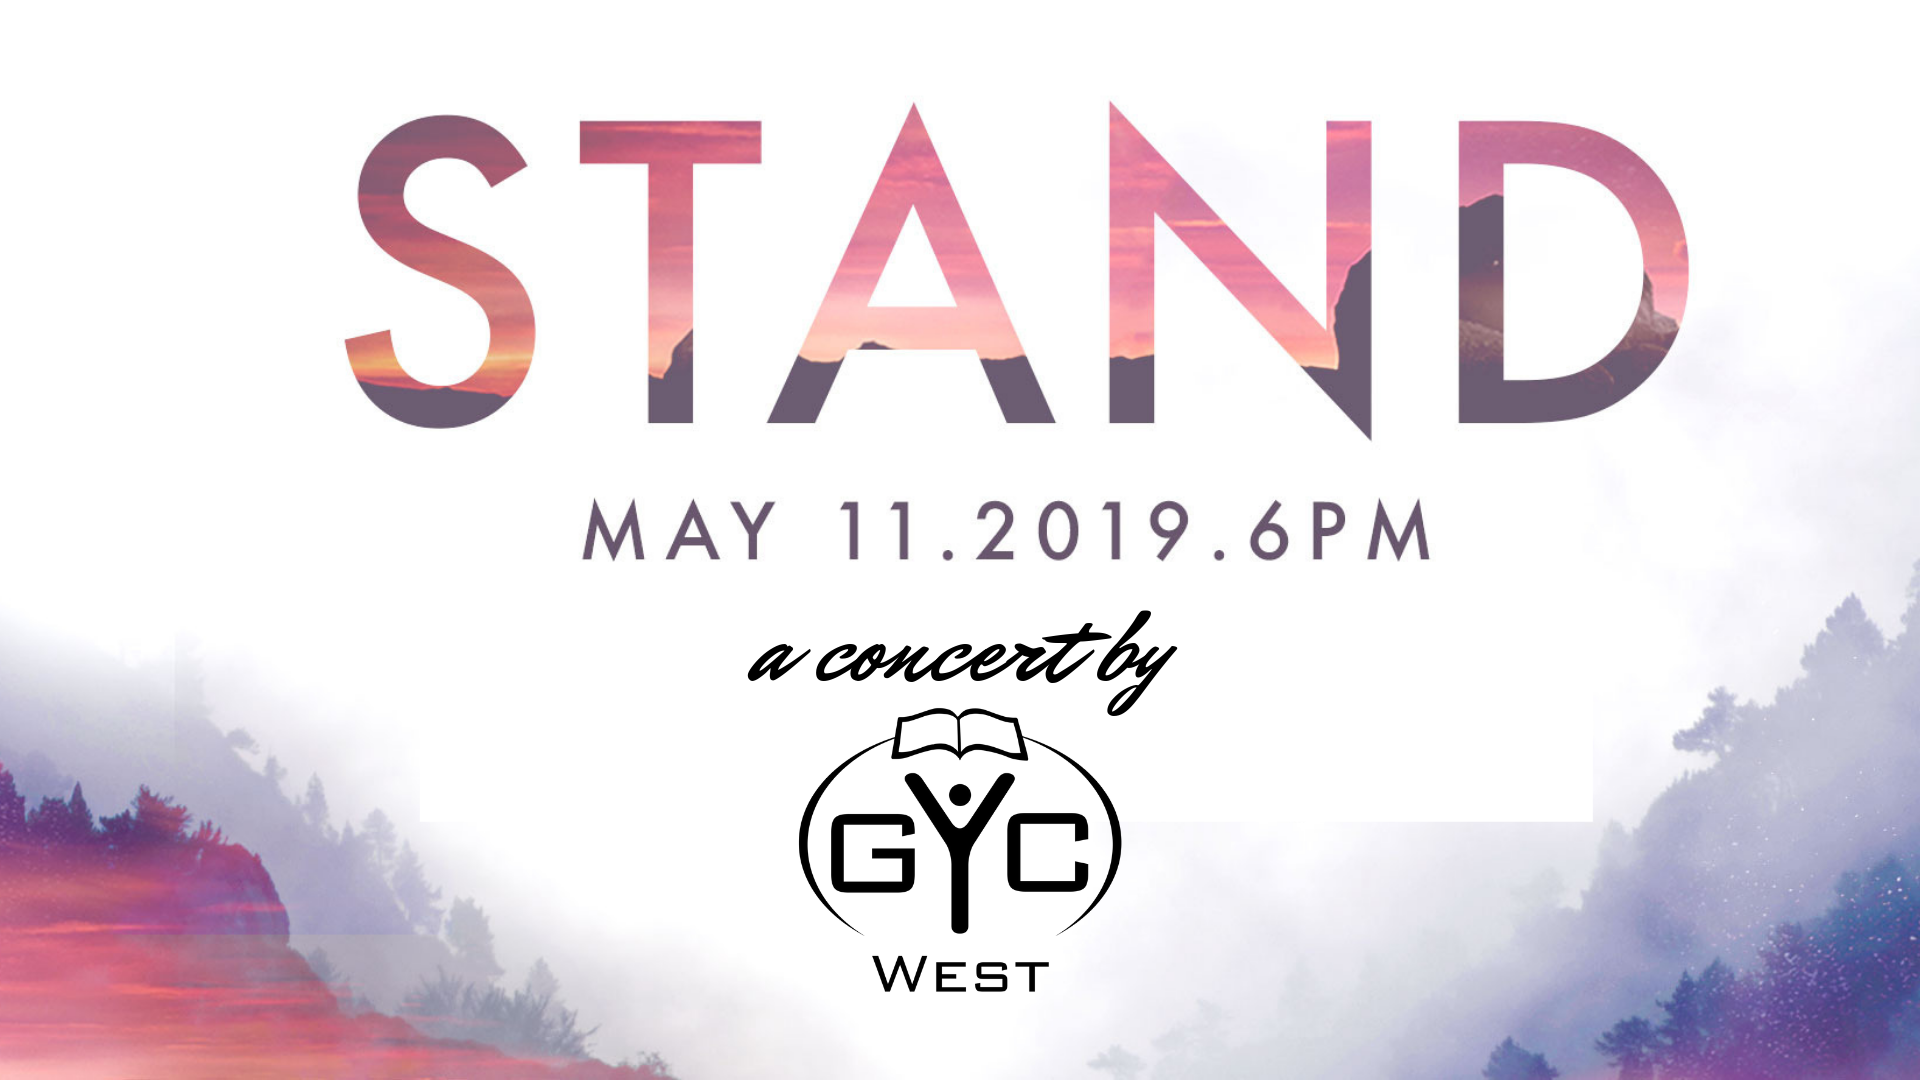 GYC West Concert